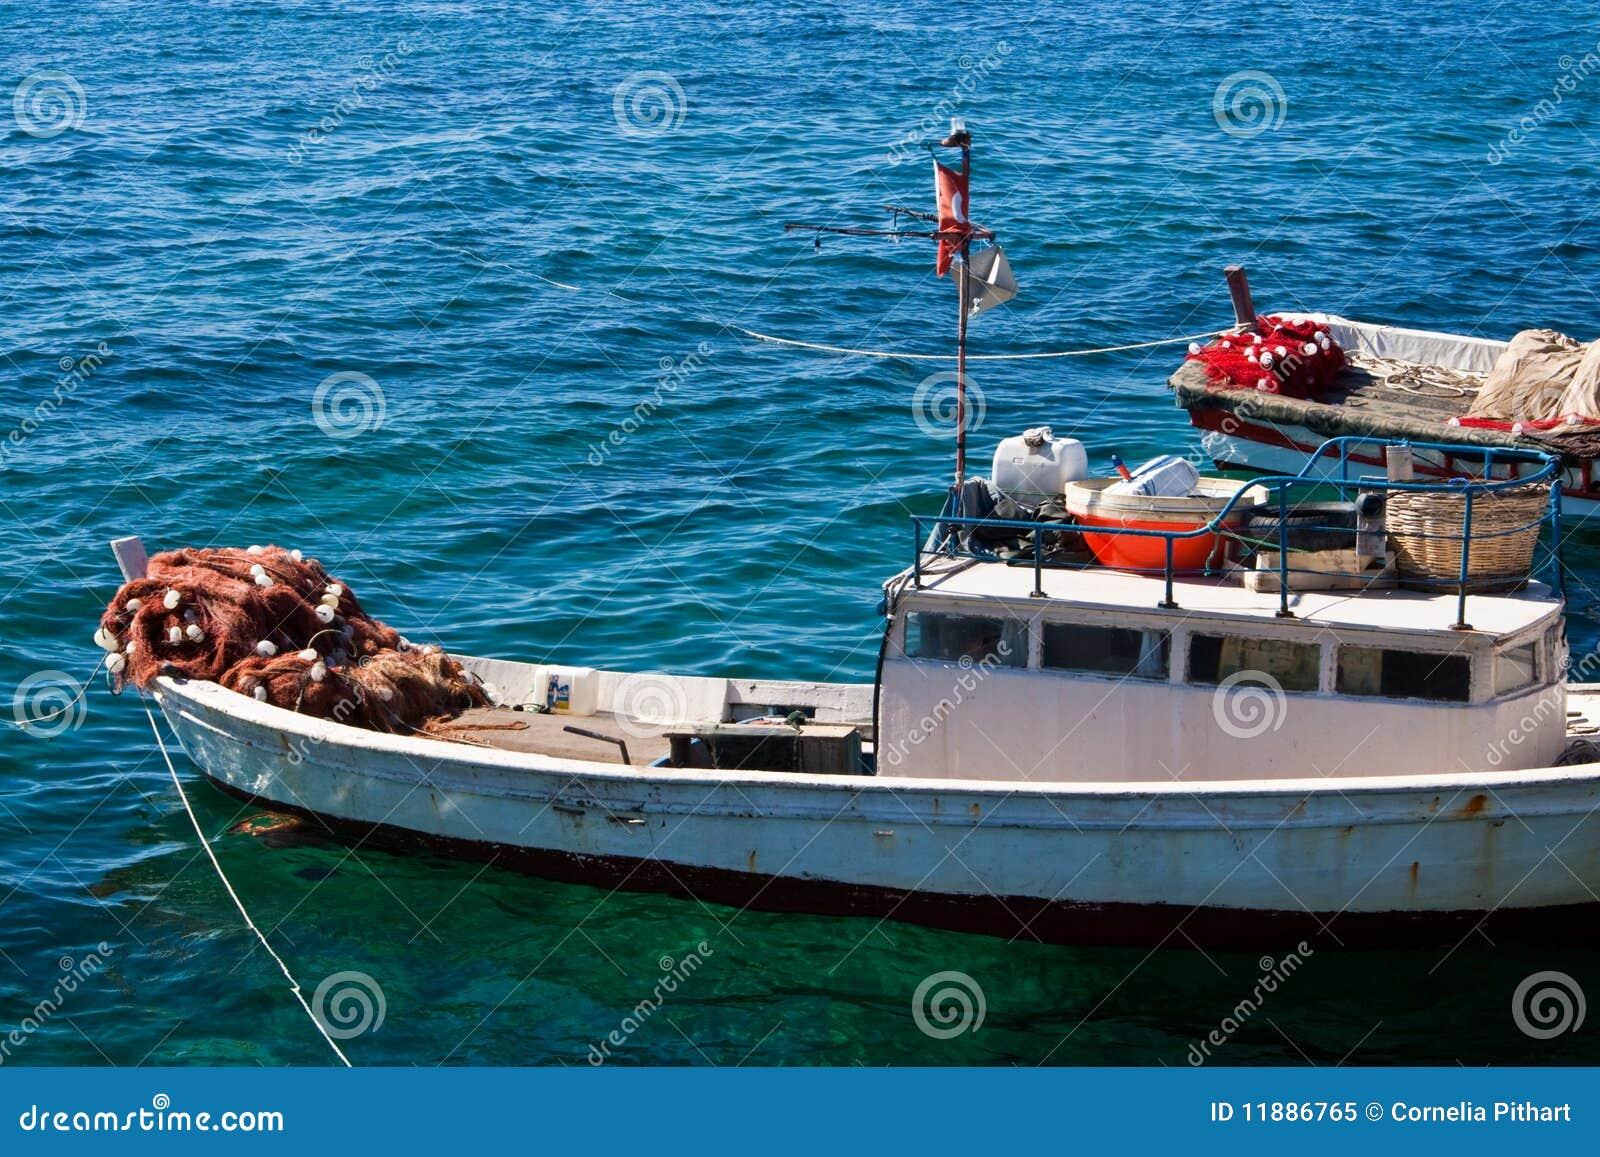 Fishing boats royalty free stock photo image 11886765 for Free fishing boats